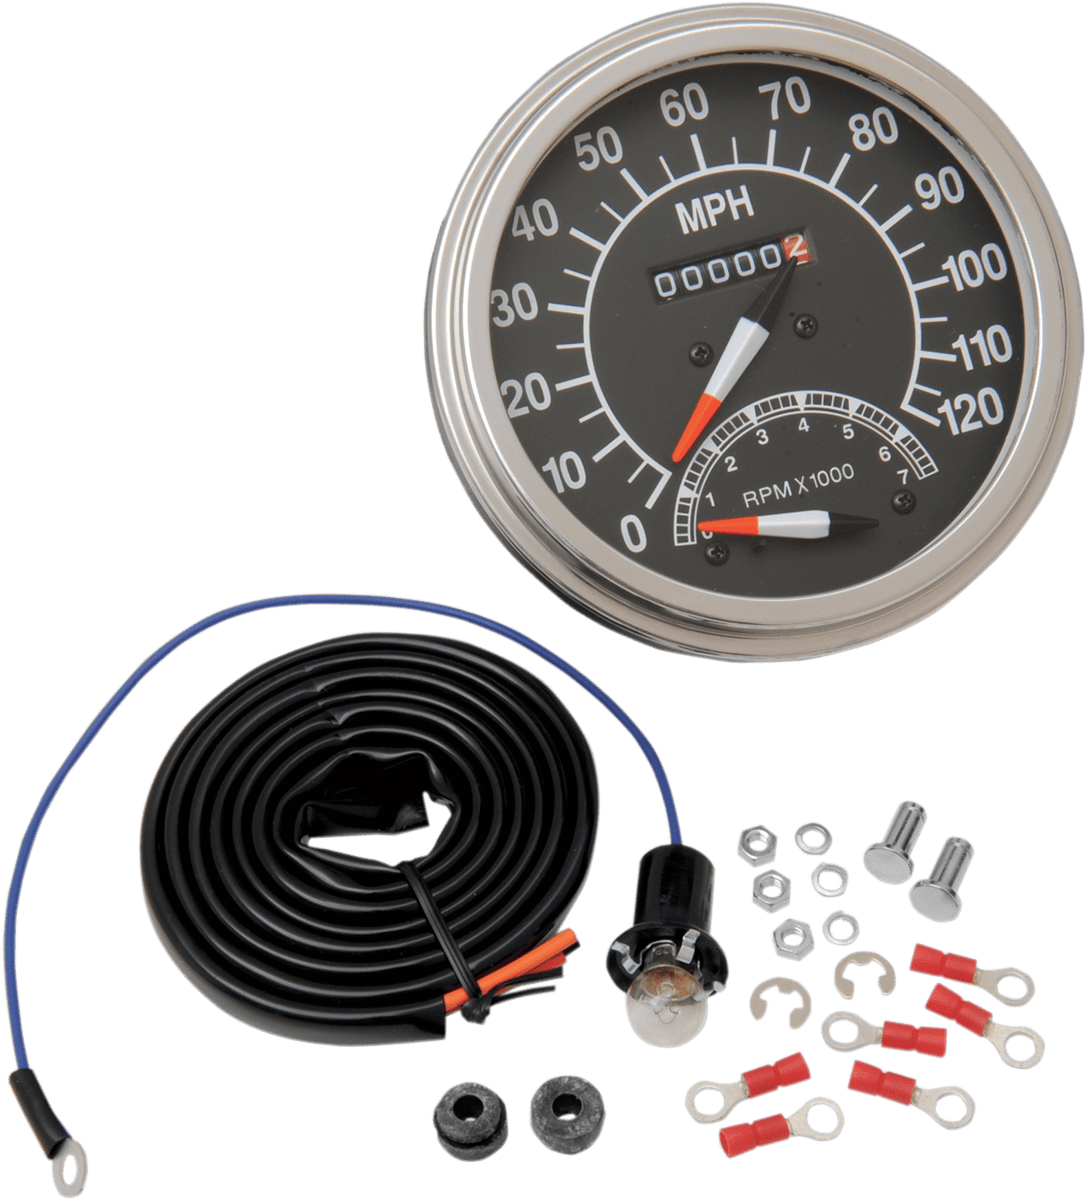 mopar tach wiring diagram wiring librarymopar tachometer wiring diagram explained wiring diagrams harley speed sensor wiring [ 1087 x 1200 Pixel ]